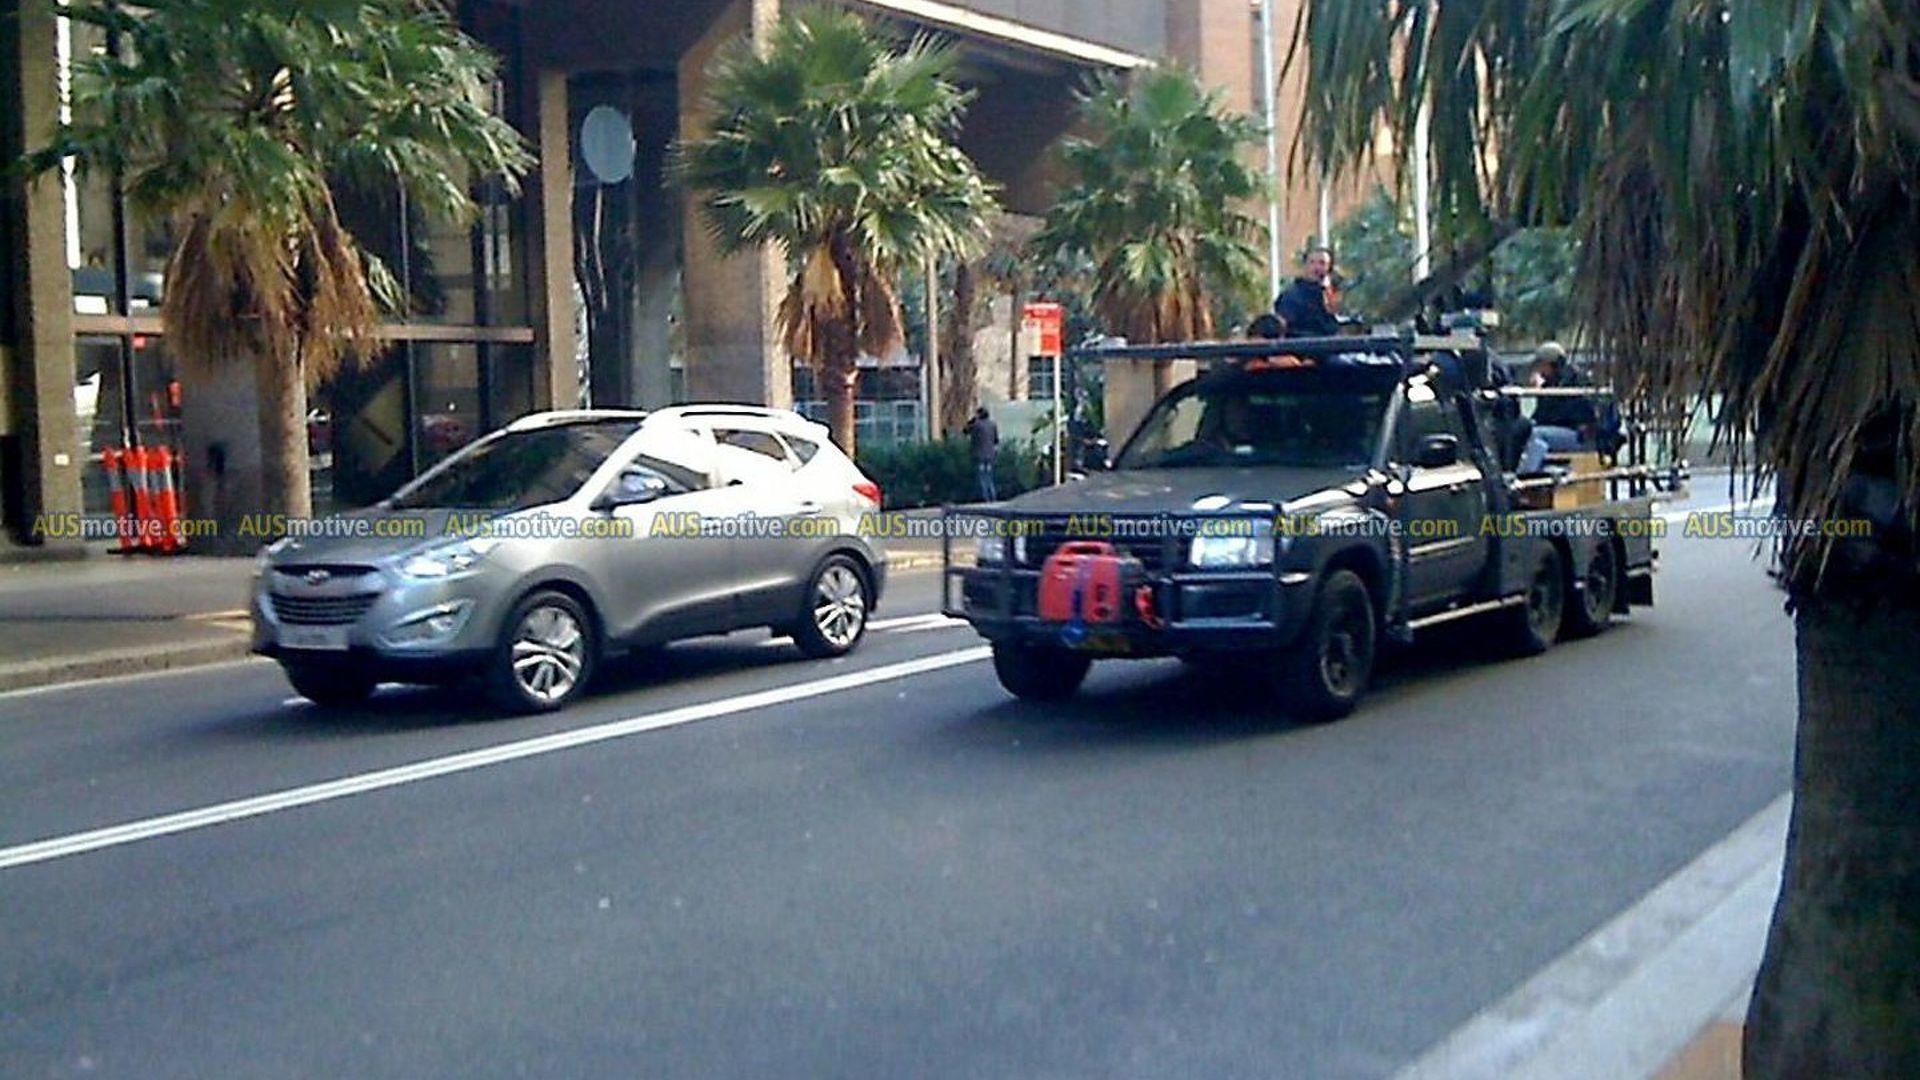 2011 Hyundai Tucson ix35 spied filming TV commercial in Sydney